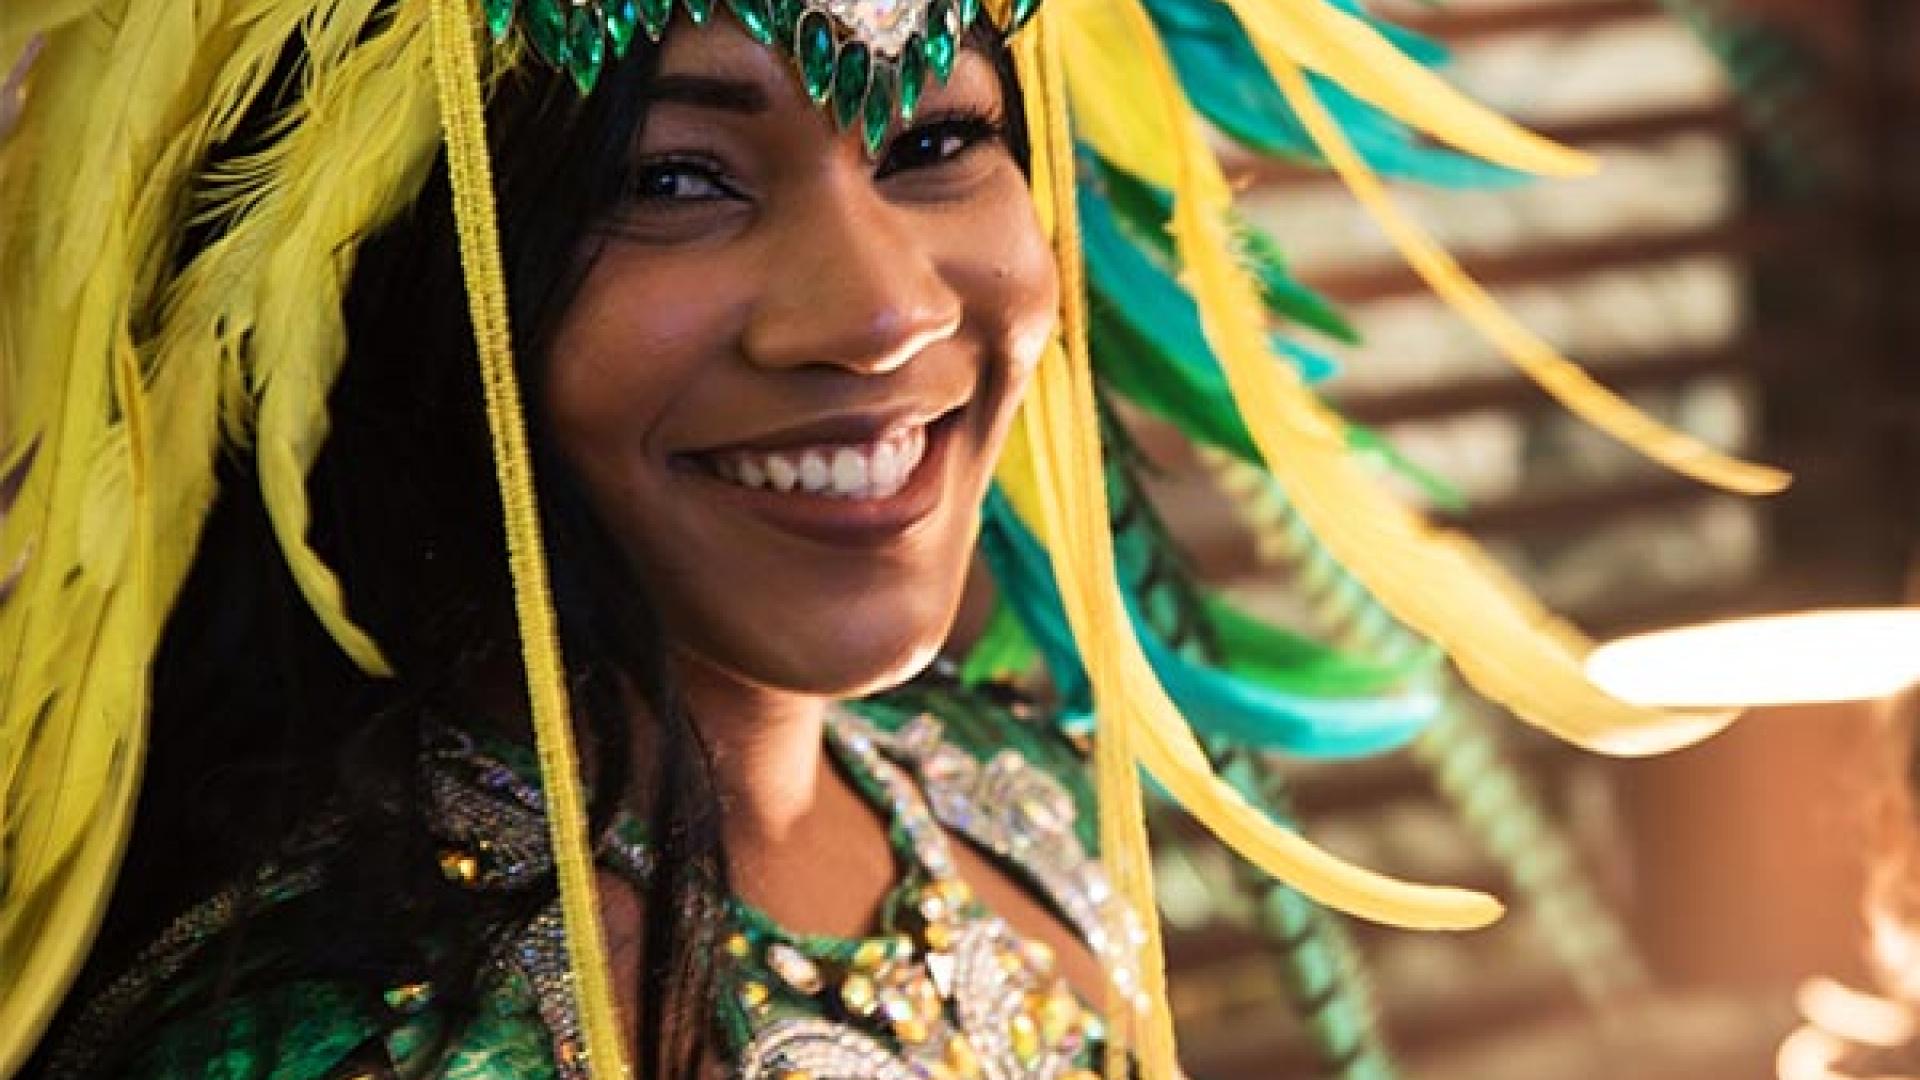 Escapism & Sandals: A Taste of the Caribbean Party